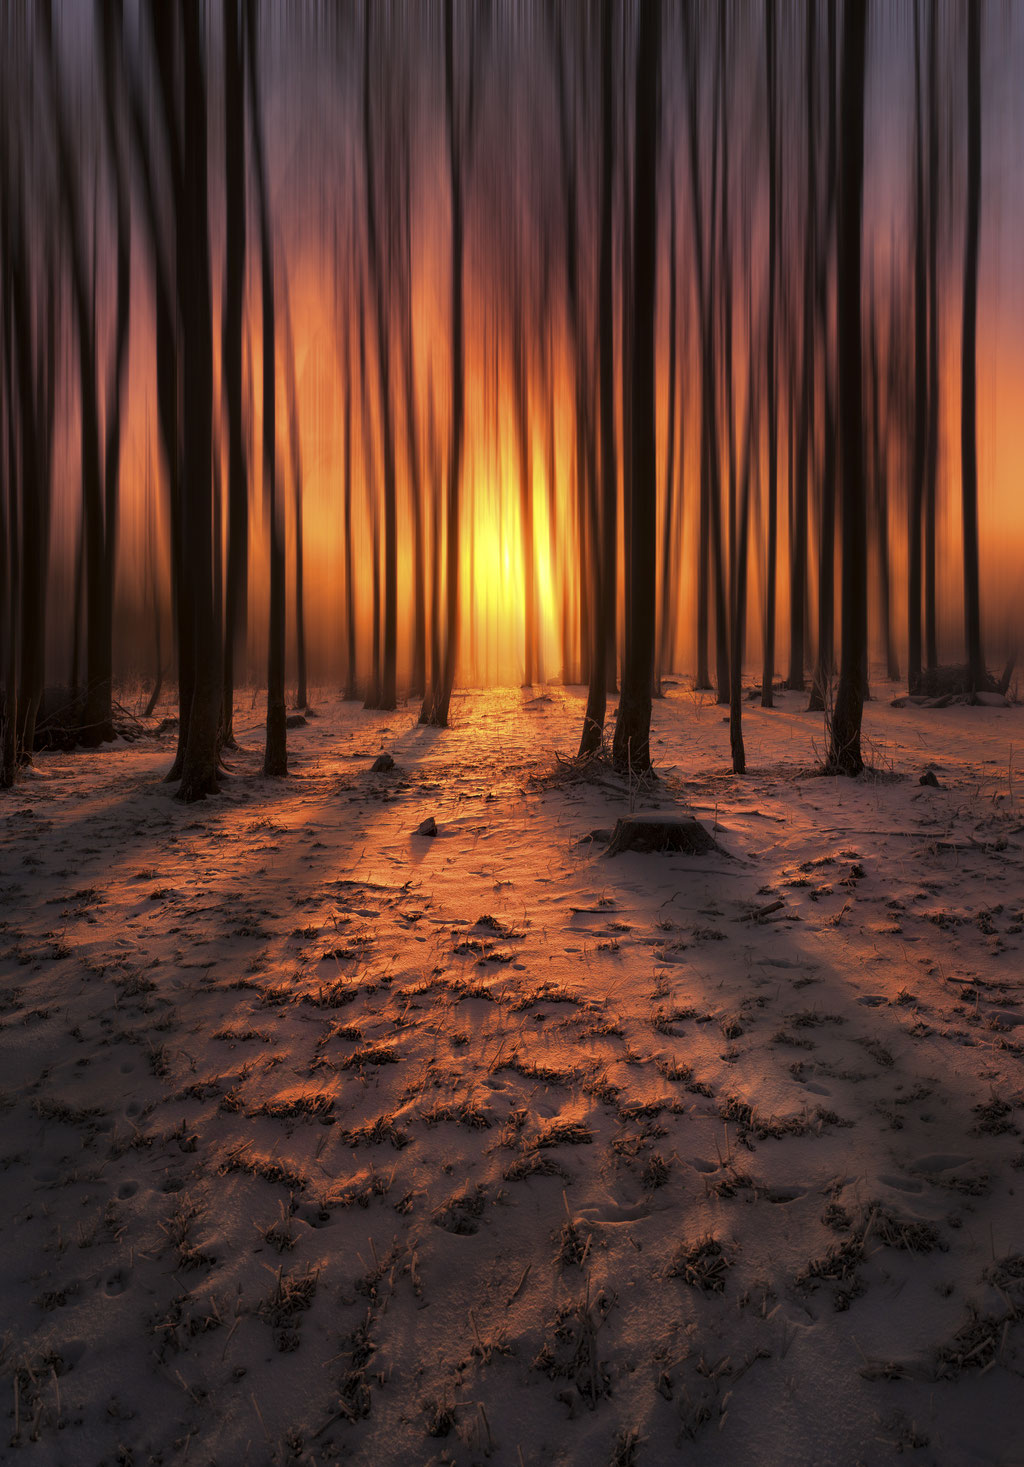 Forêt - Col Bayard - (Hautes Alpes-France) © Arzur Michaël